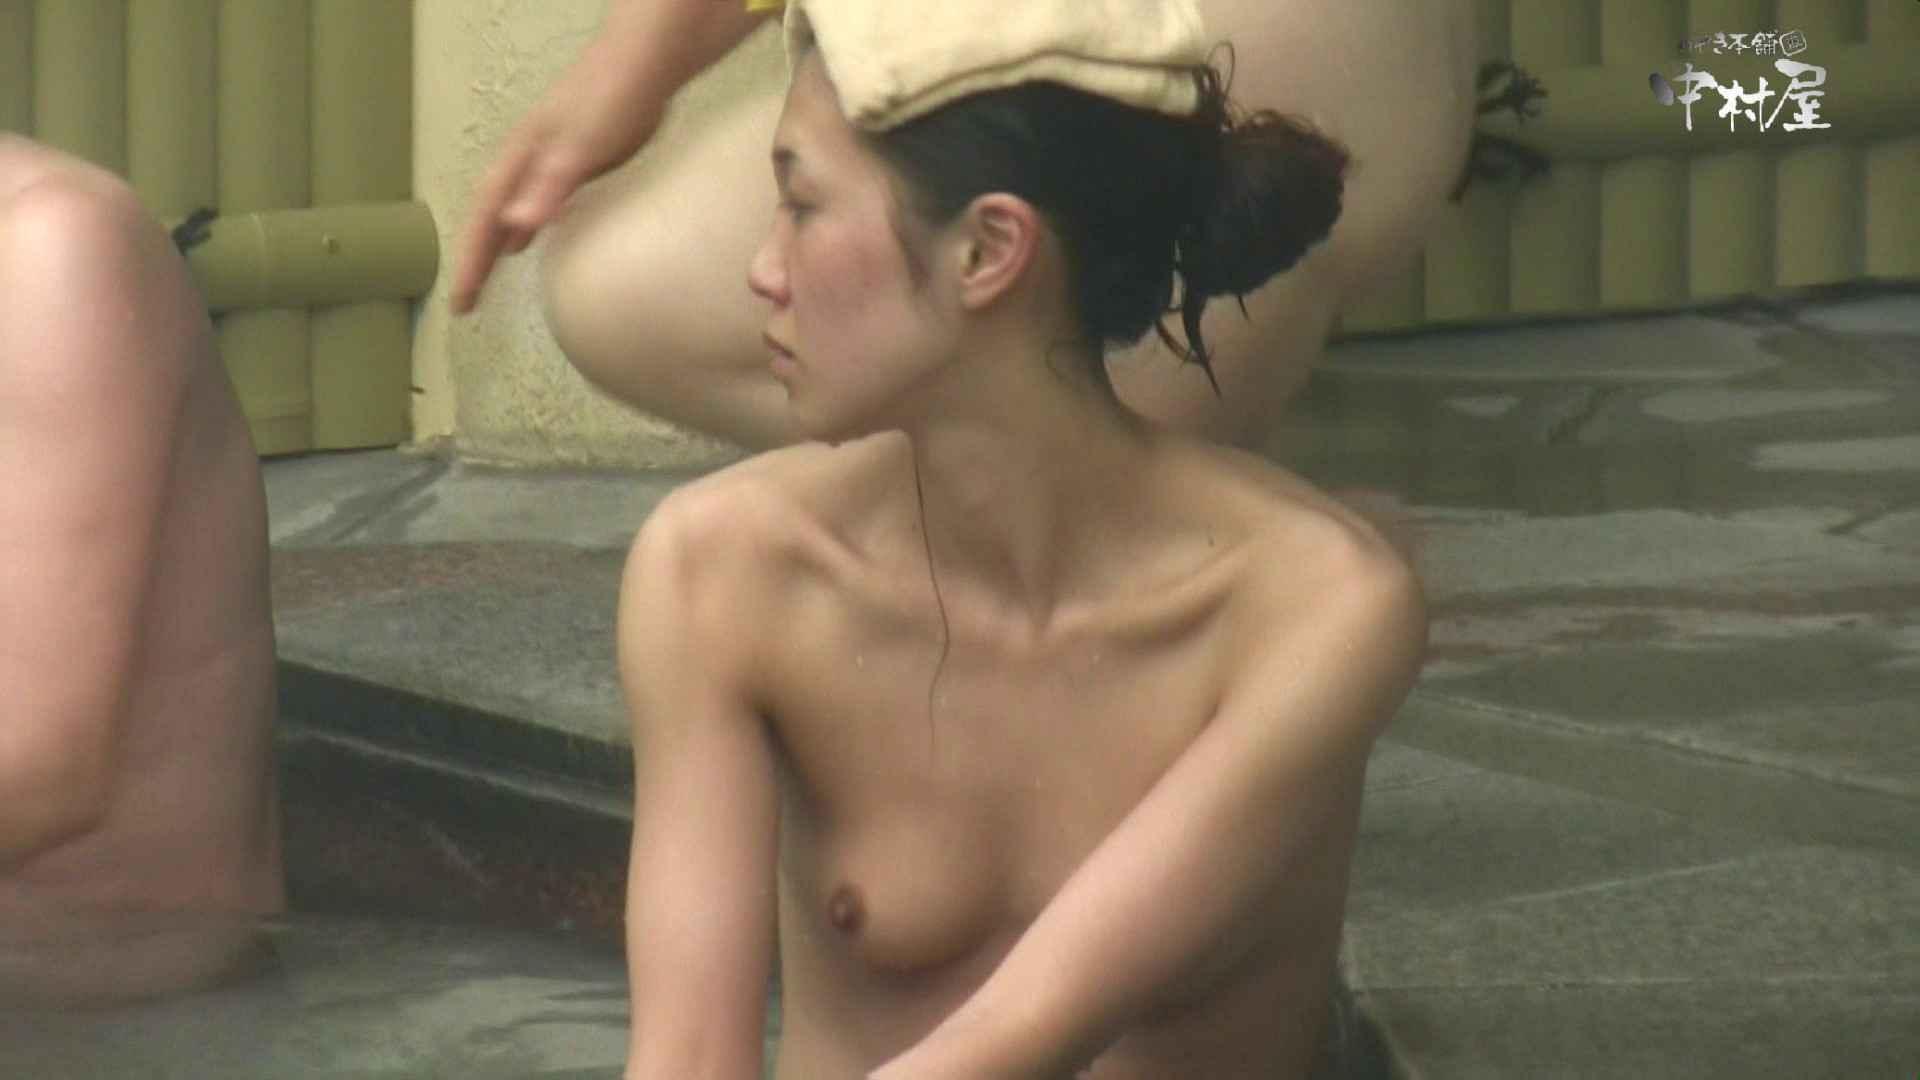 Aquaな露天風呂Vol.889 0   0  87連発 45